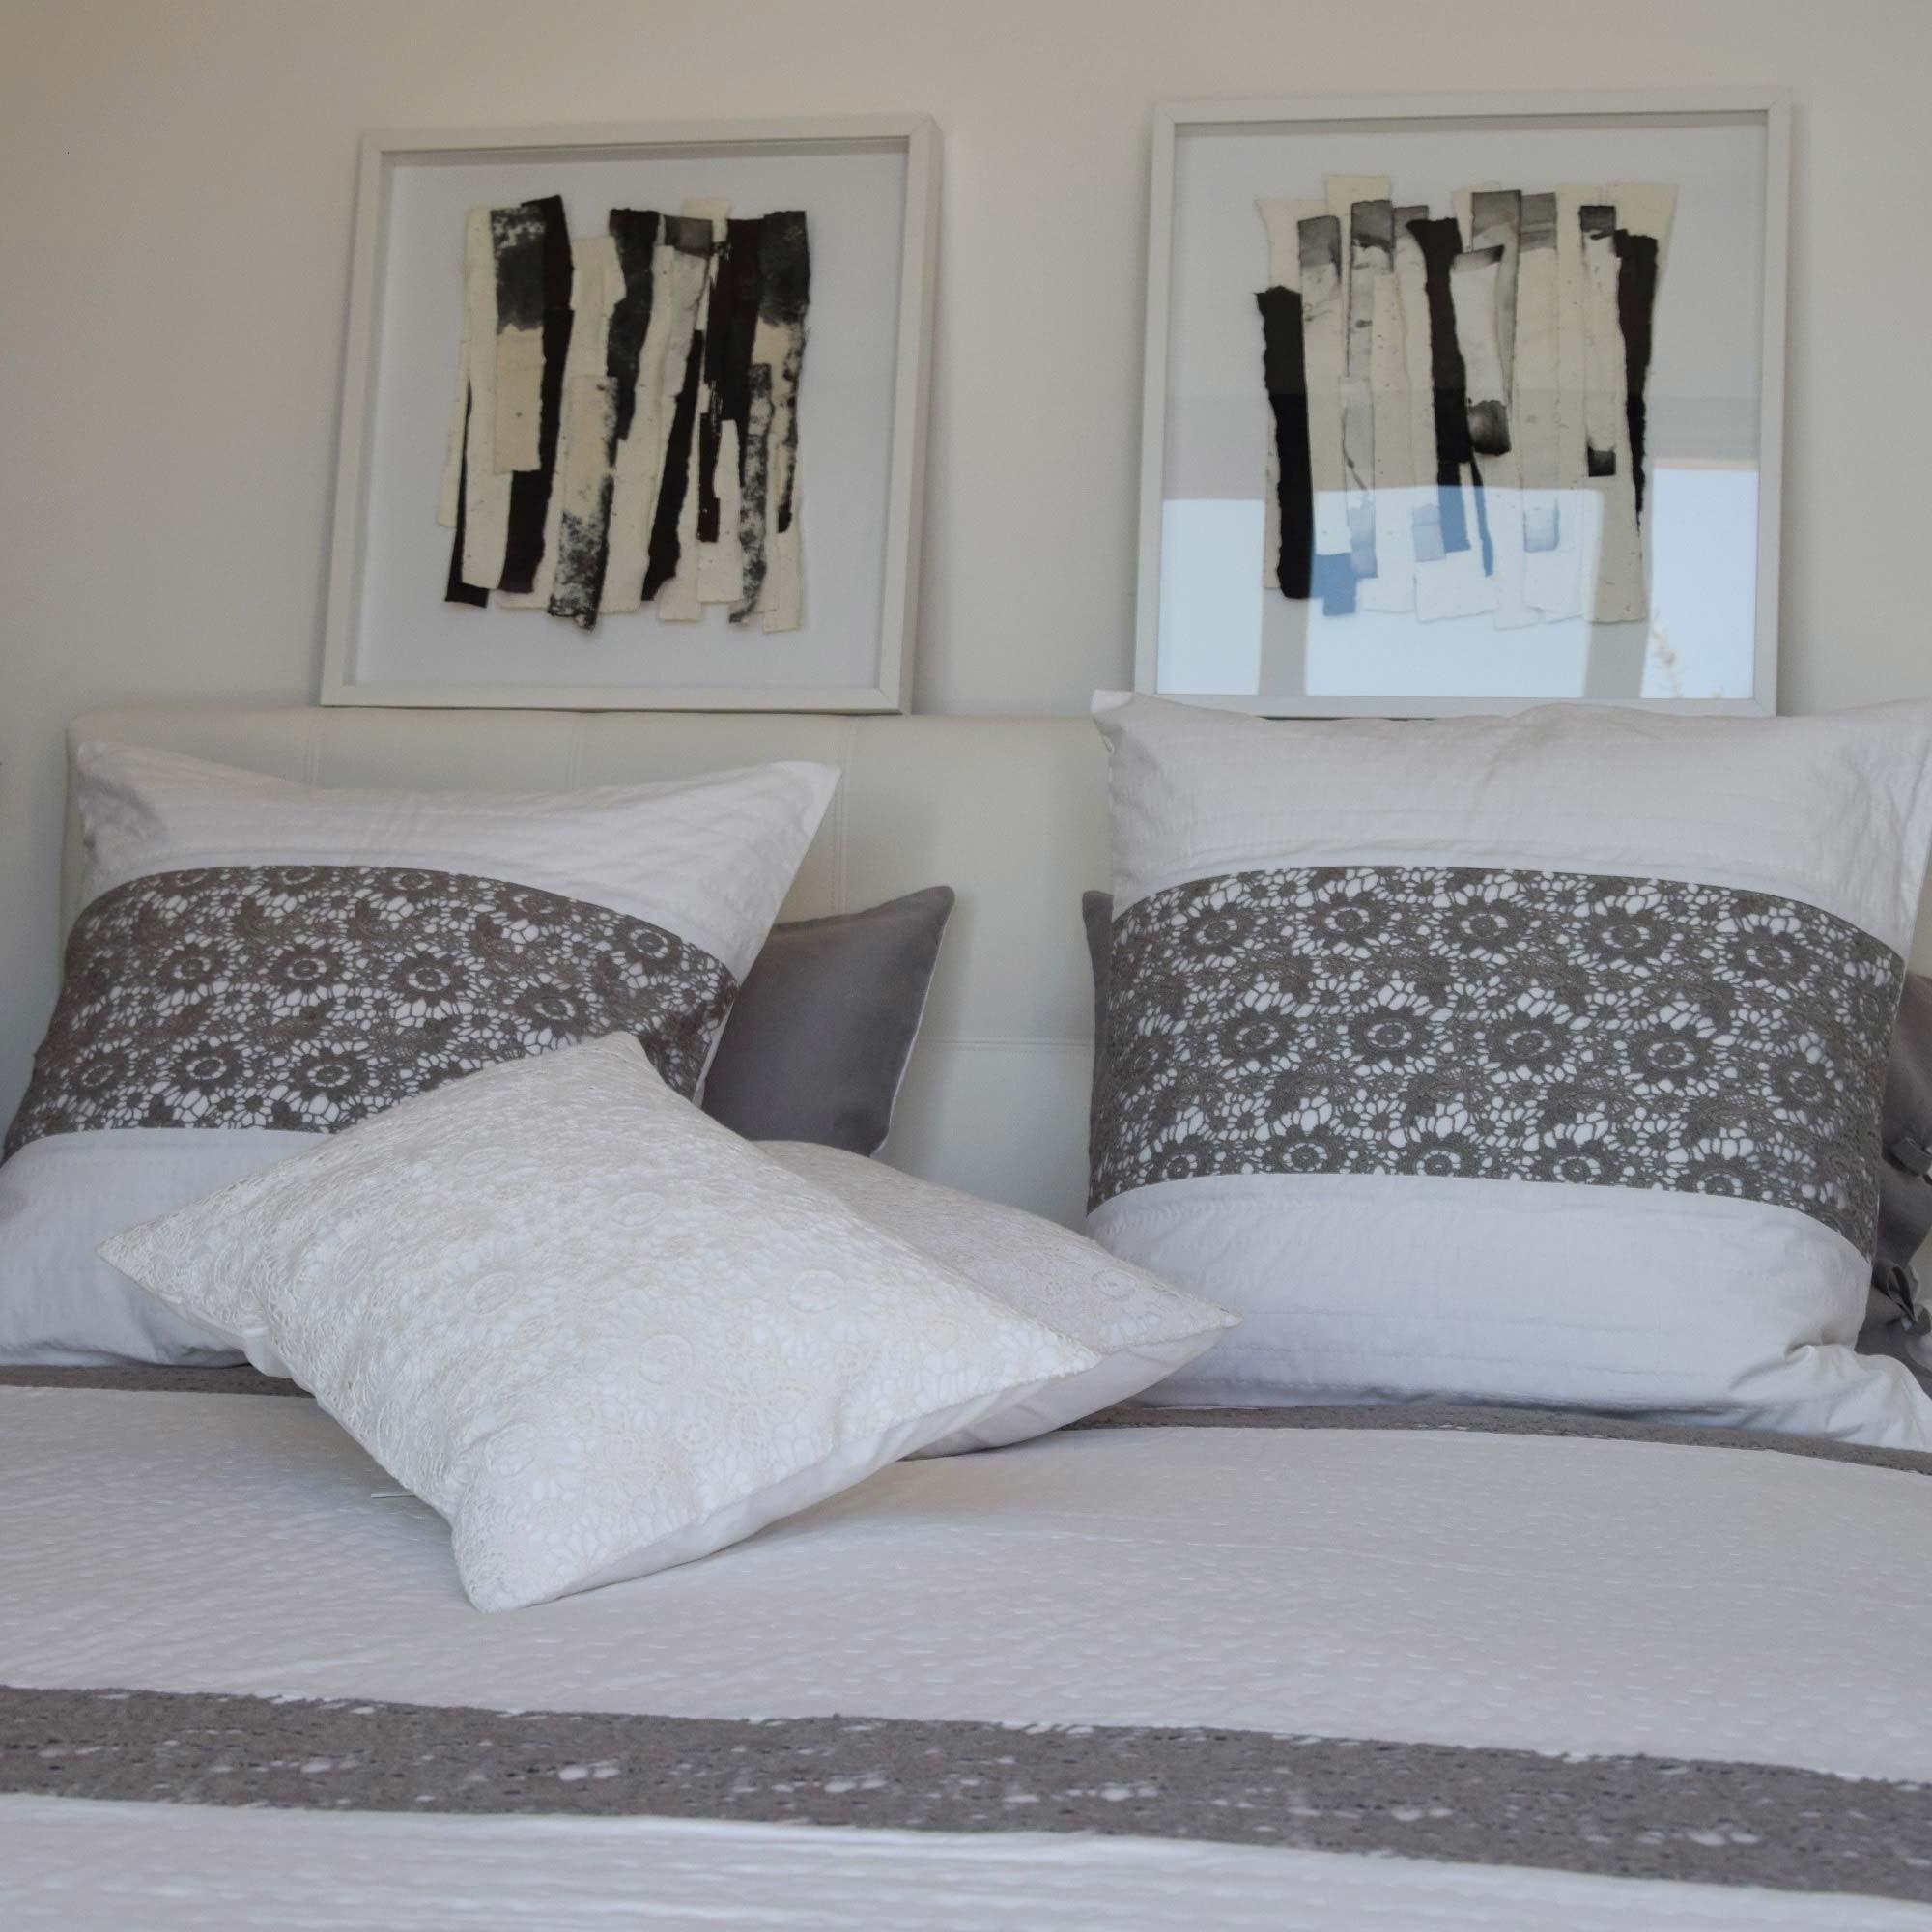 couvre lit blanc et noir White and gray Nantes bedspread   Maison d'été couvre lit blanc et noir